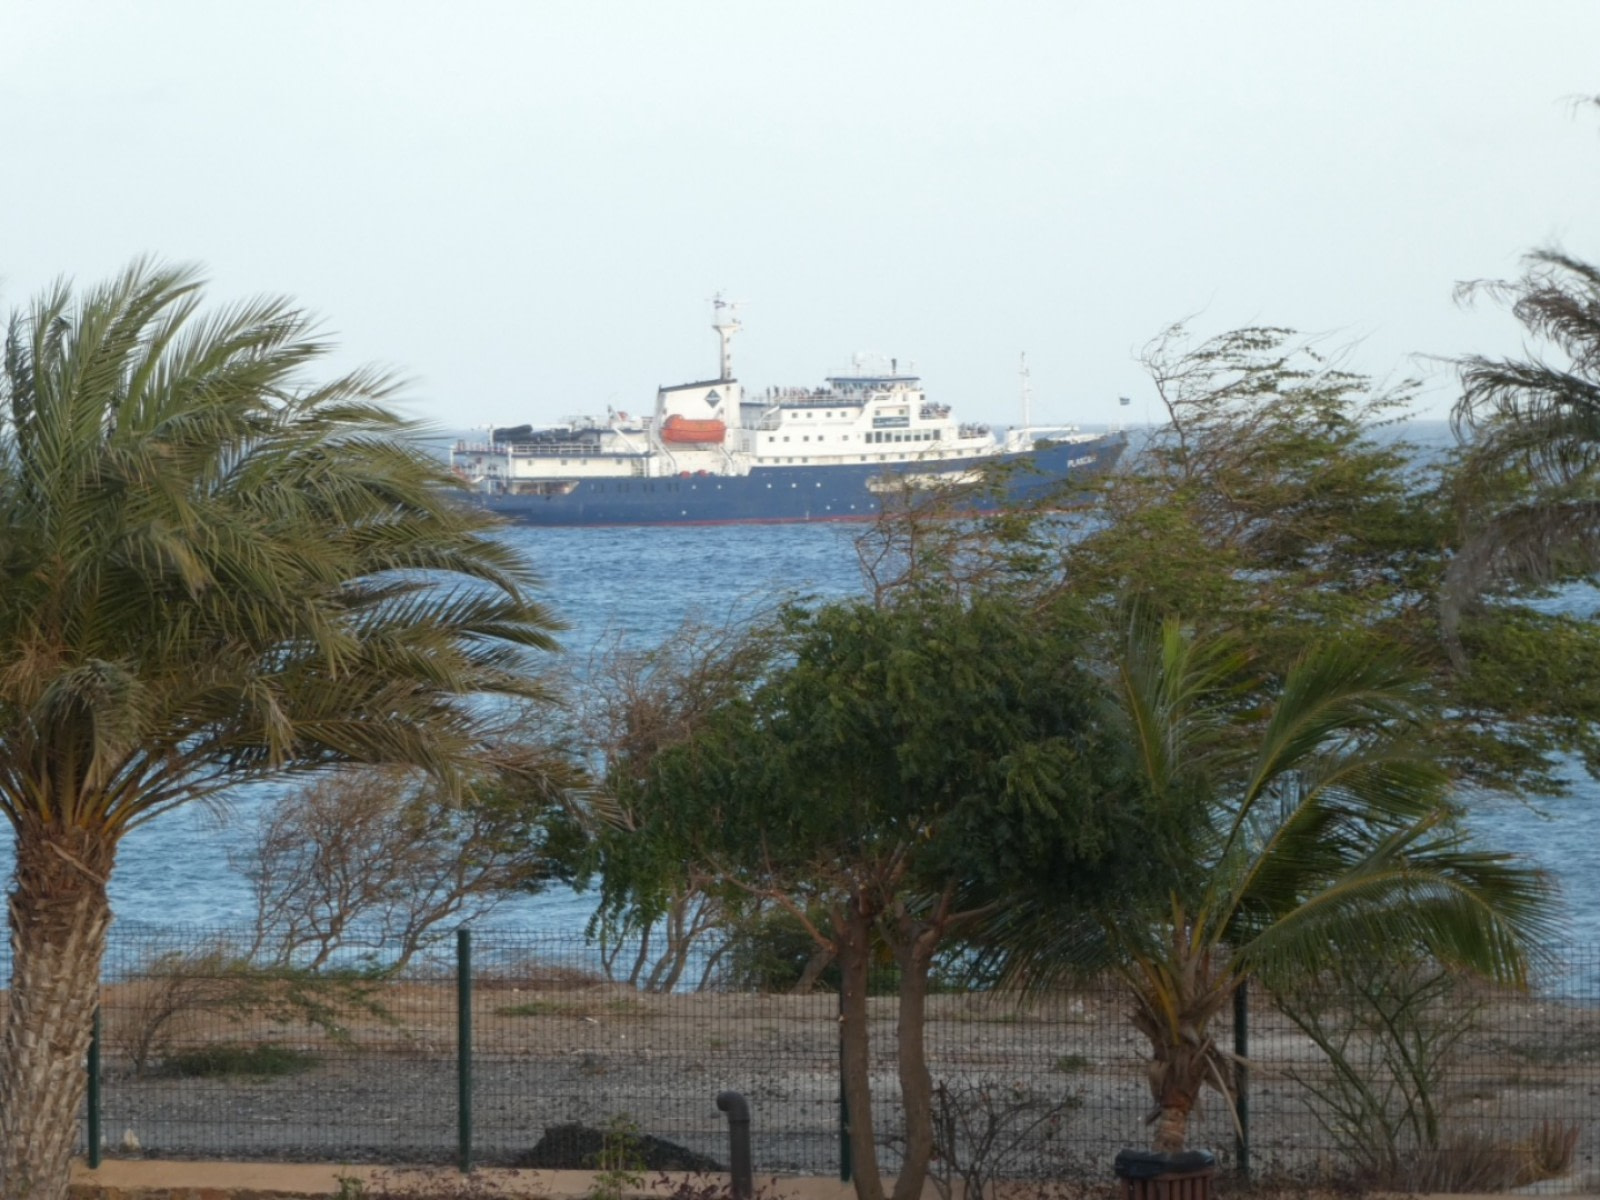 Leaving Cape Verde